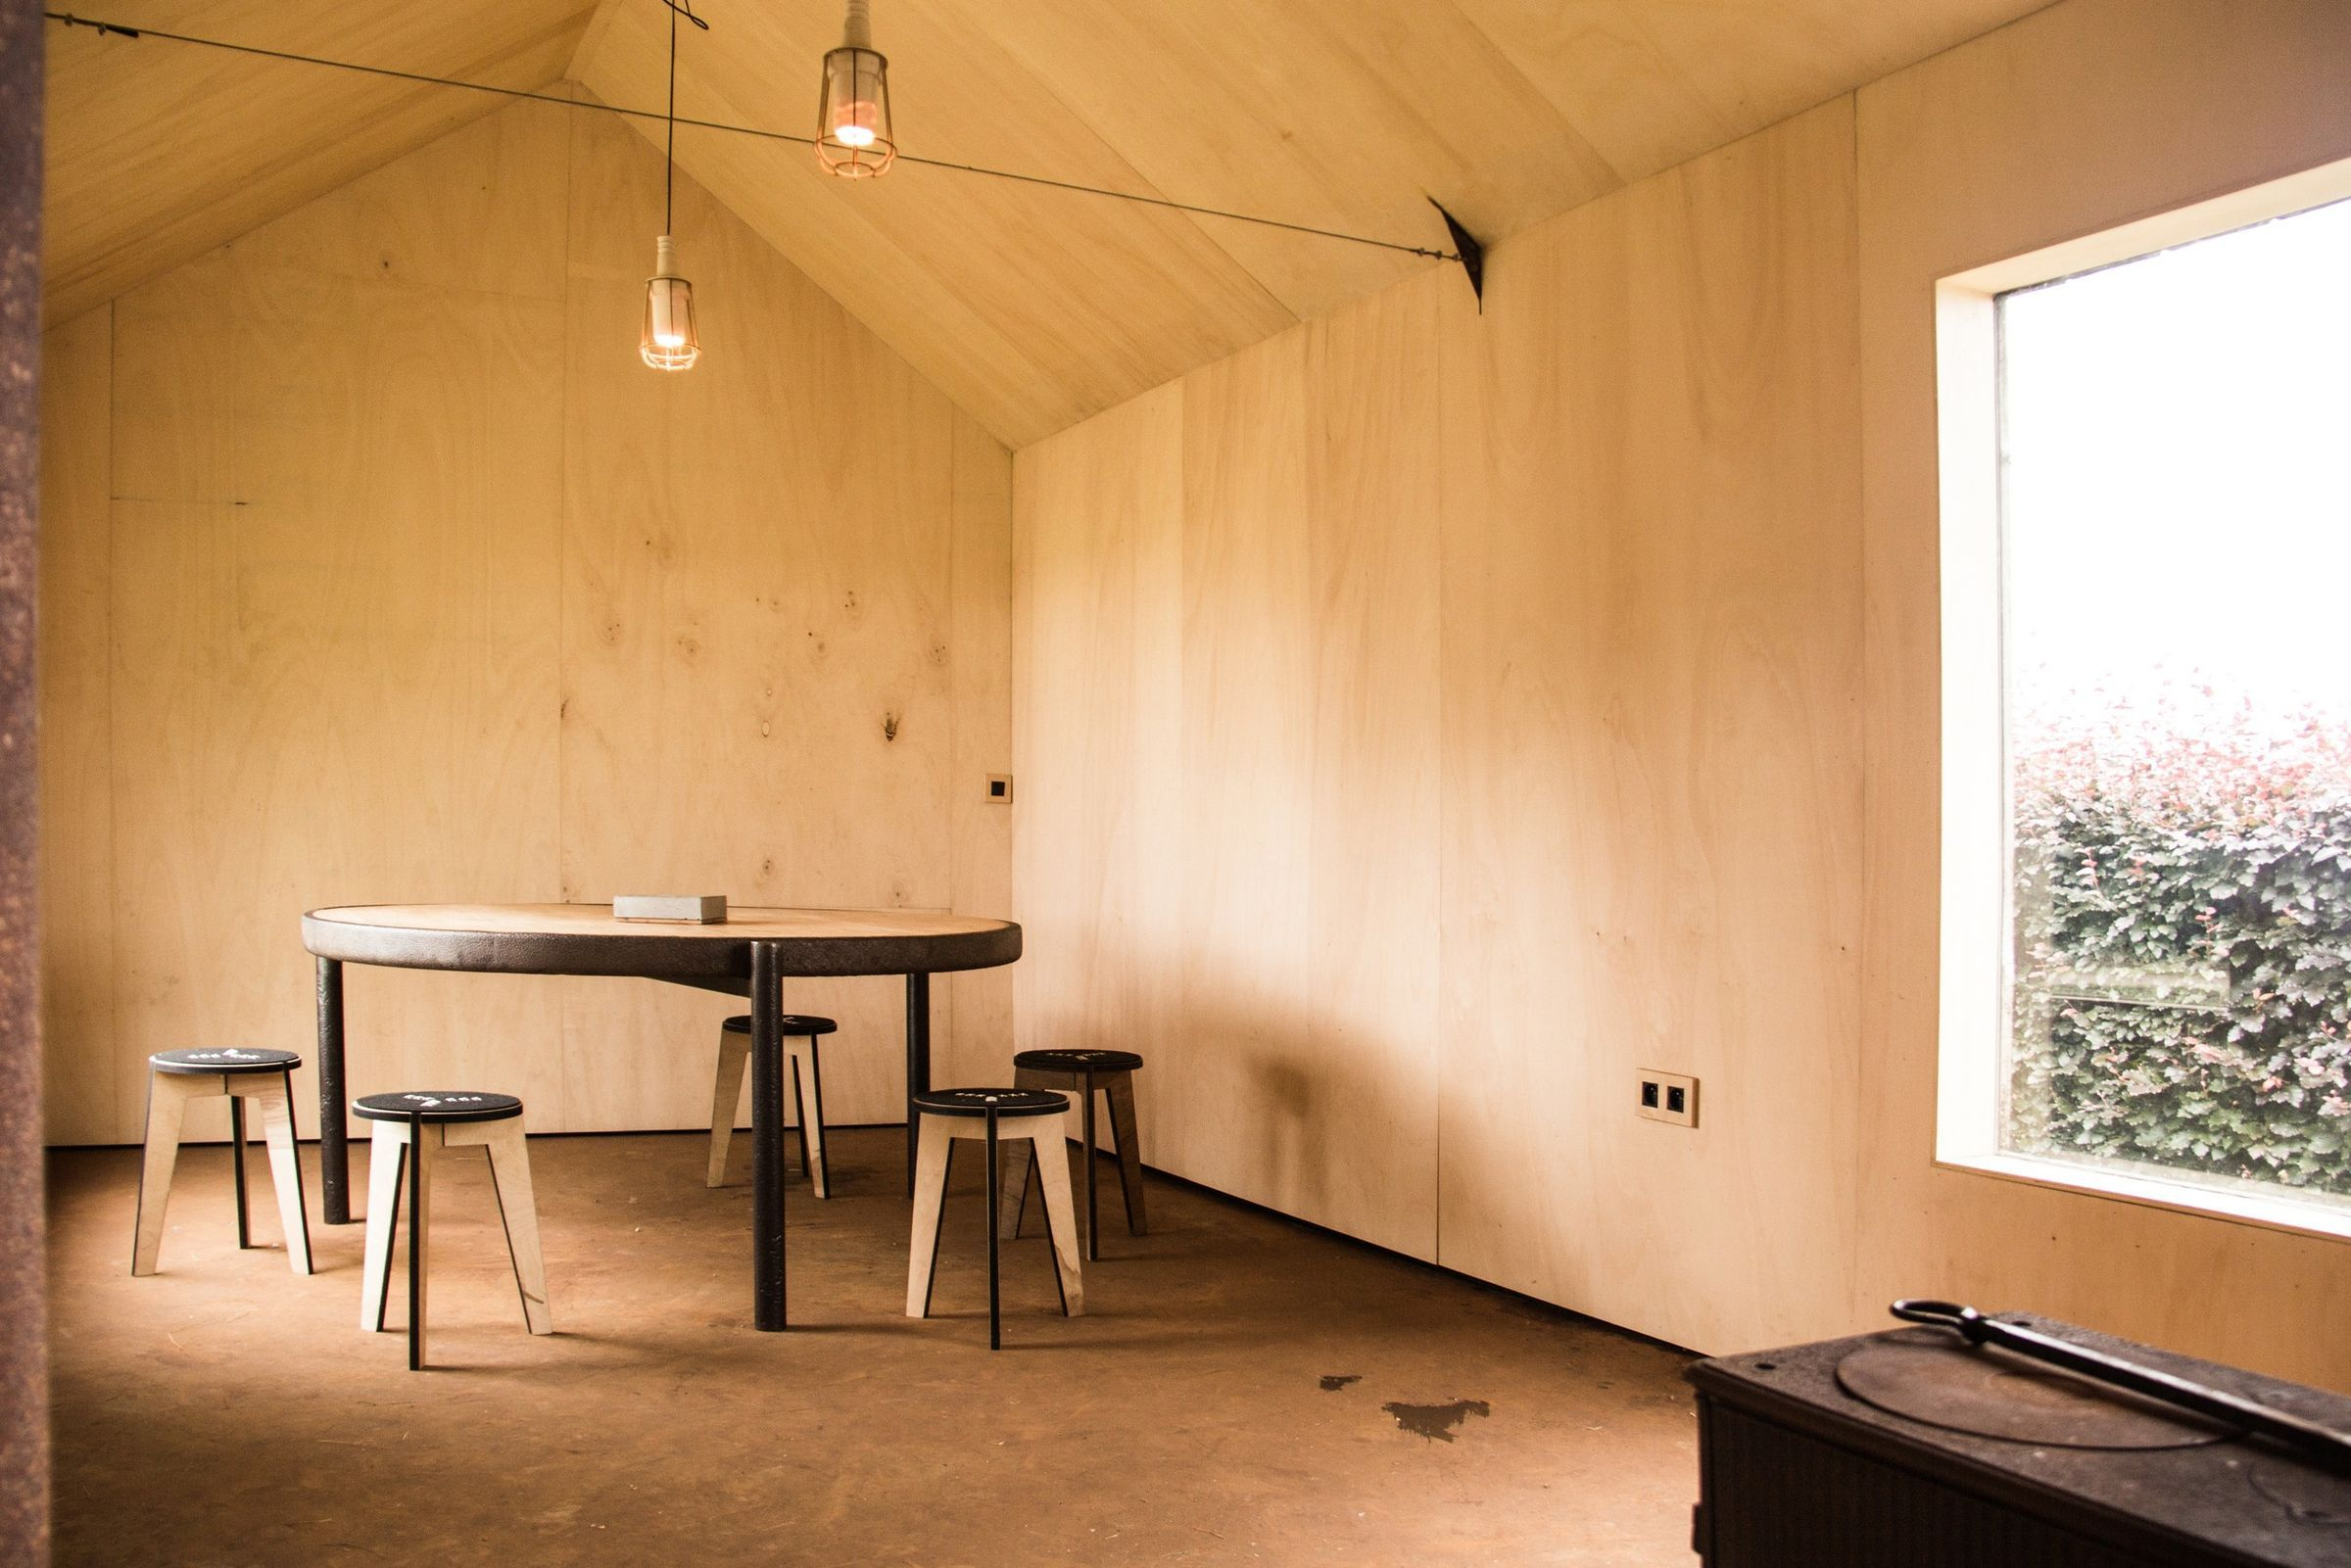 Hofer Pavilion by Stal Collectief